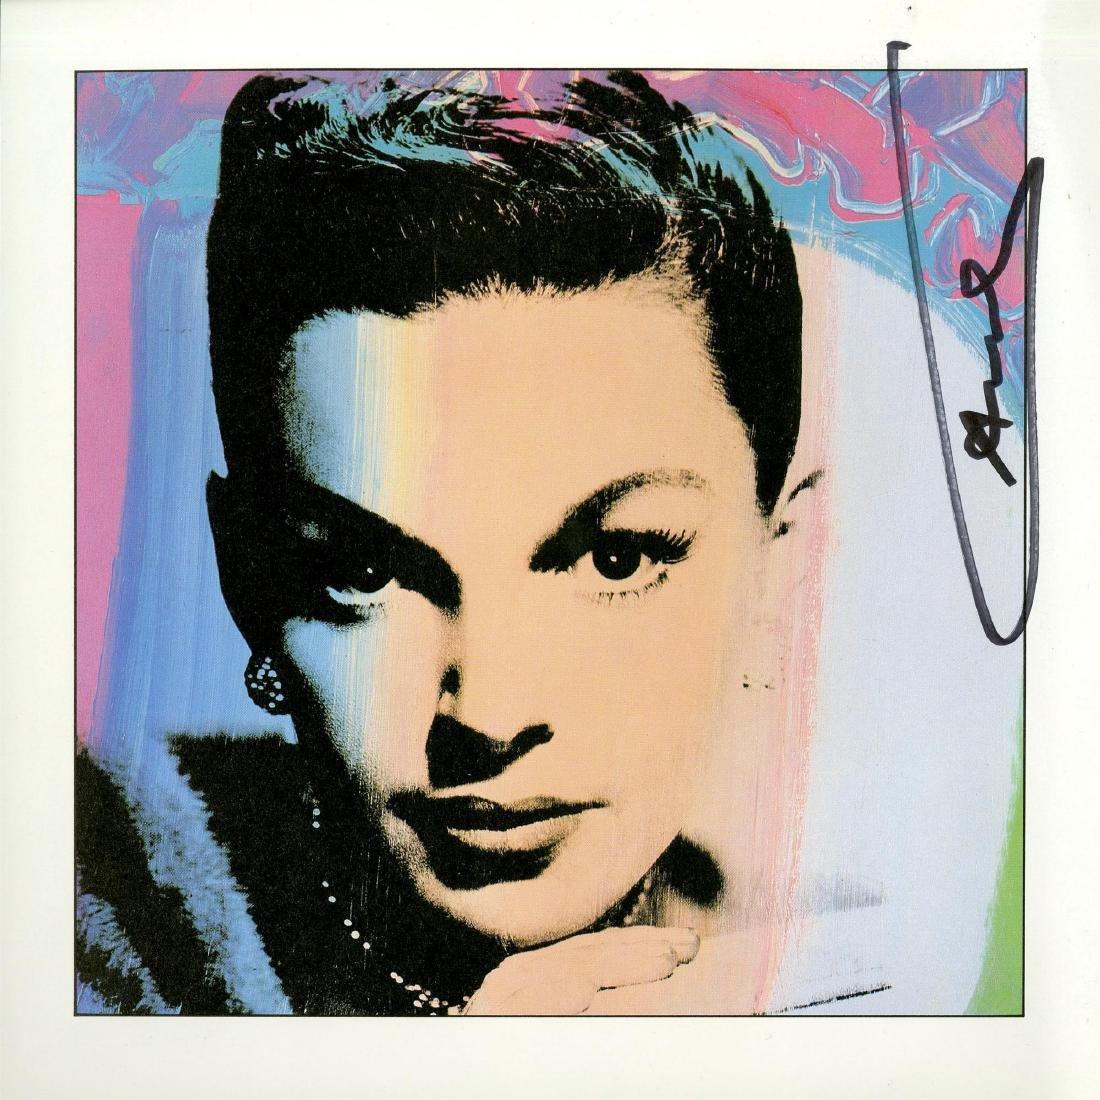 328: ANDY WARHOL - Judy Garland